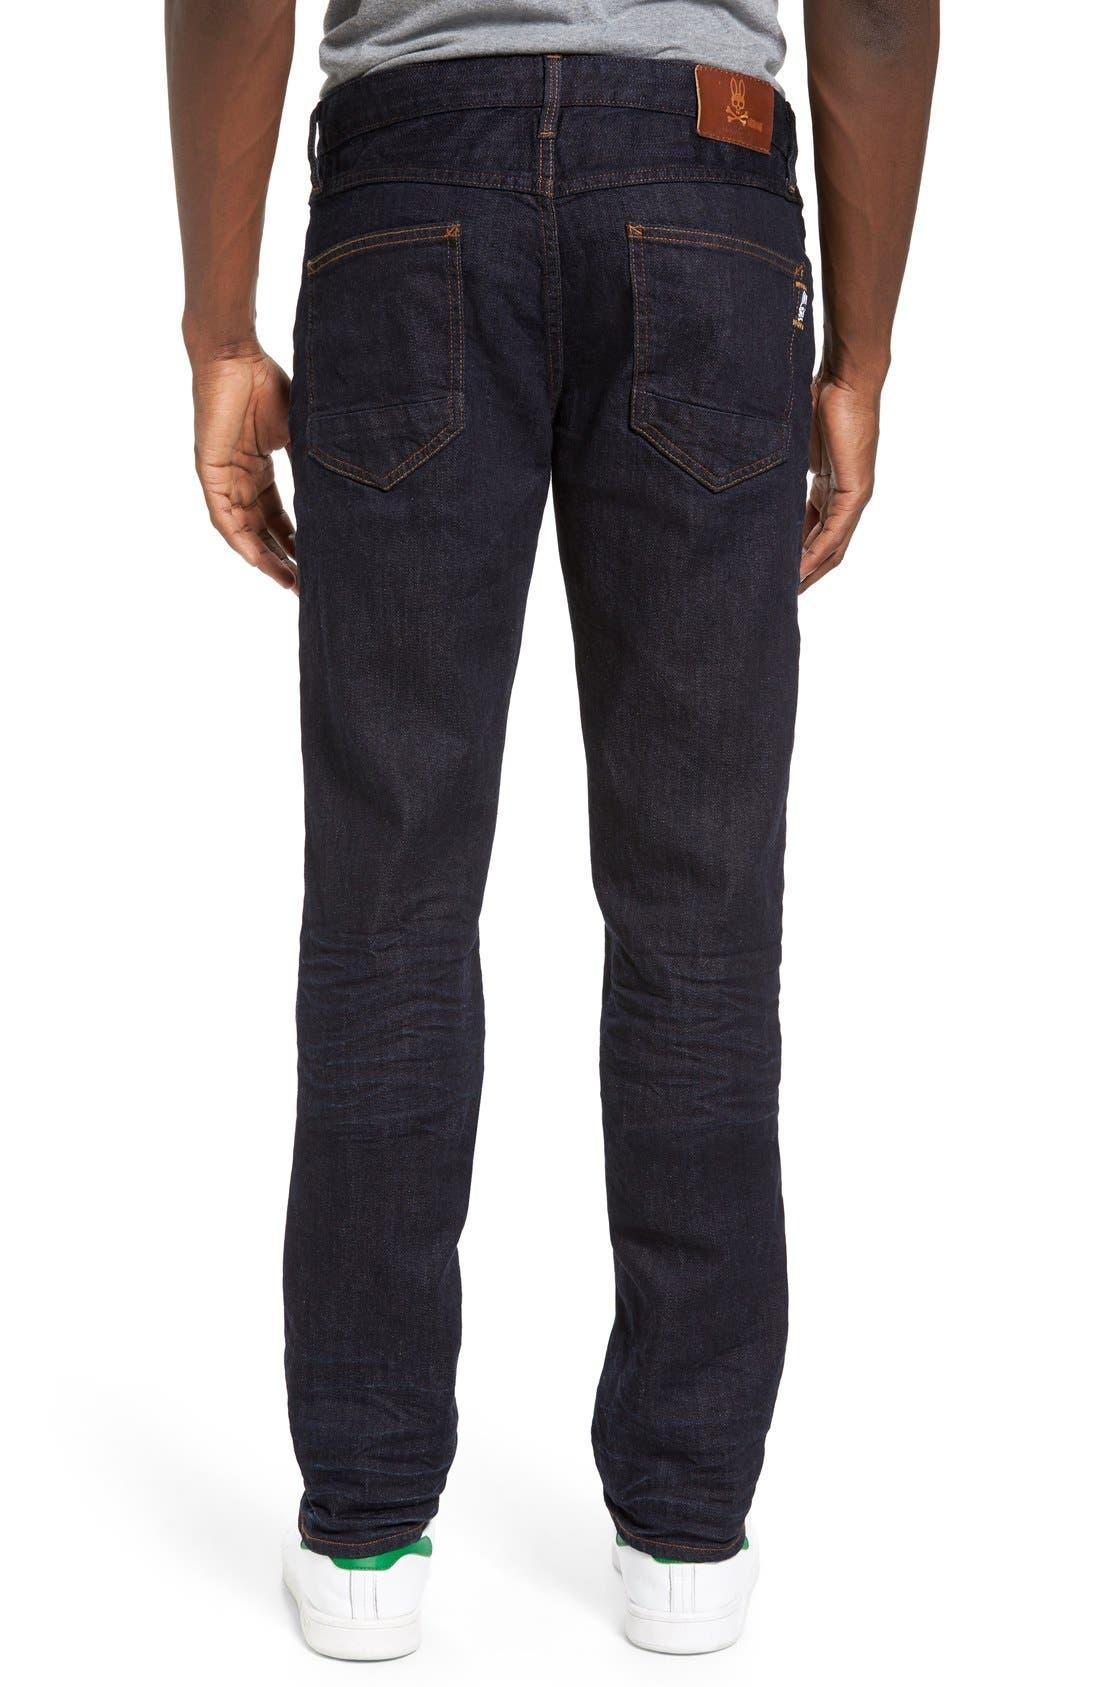 Canal Slim Fit Jeans,                             Alternate thumbnail 7, color,                             460